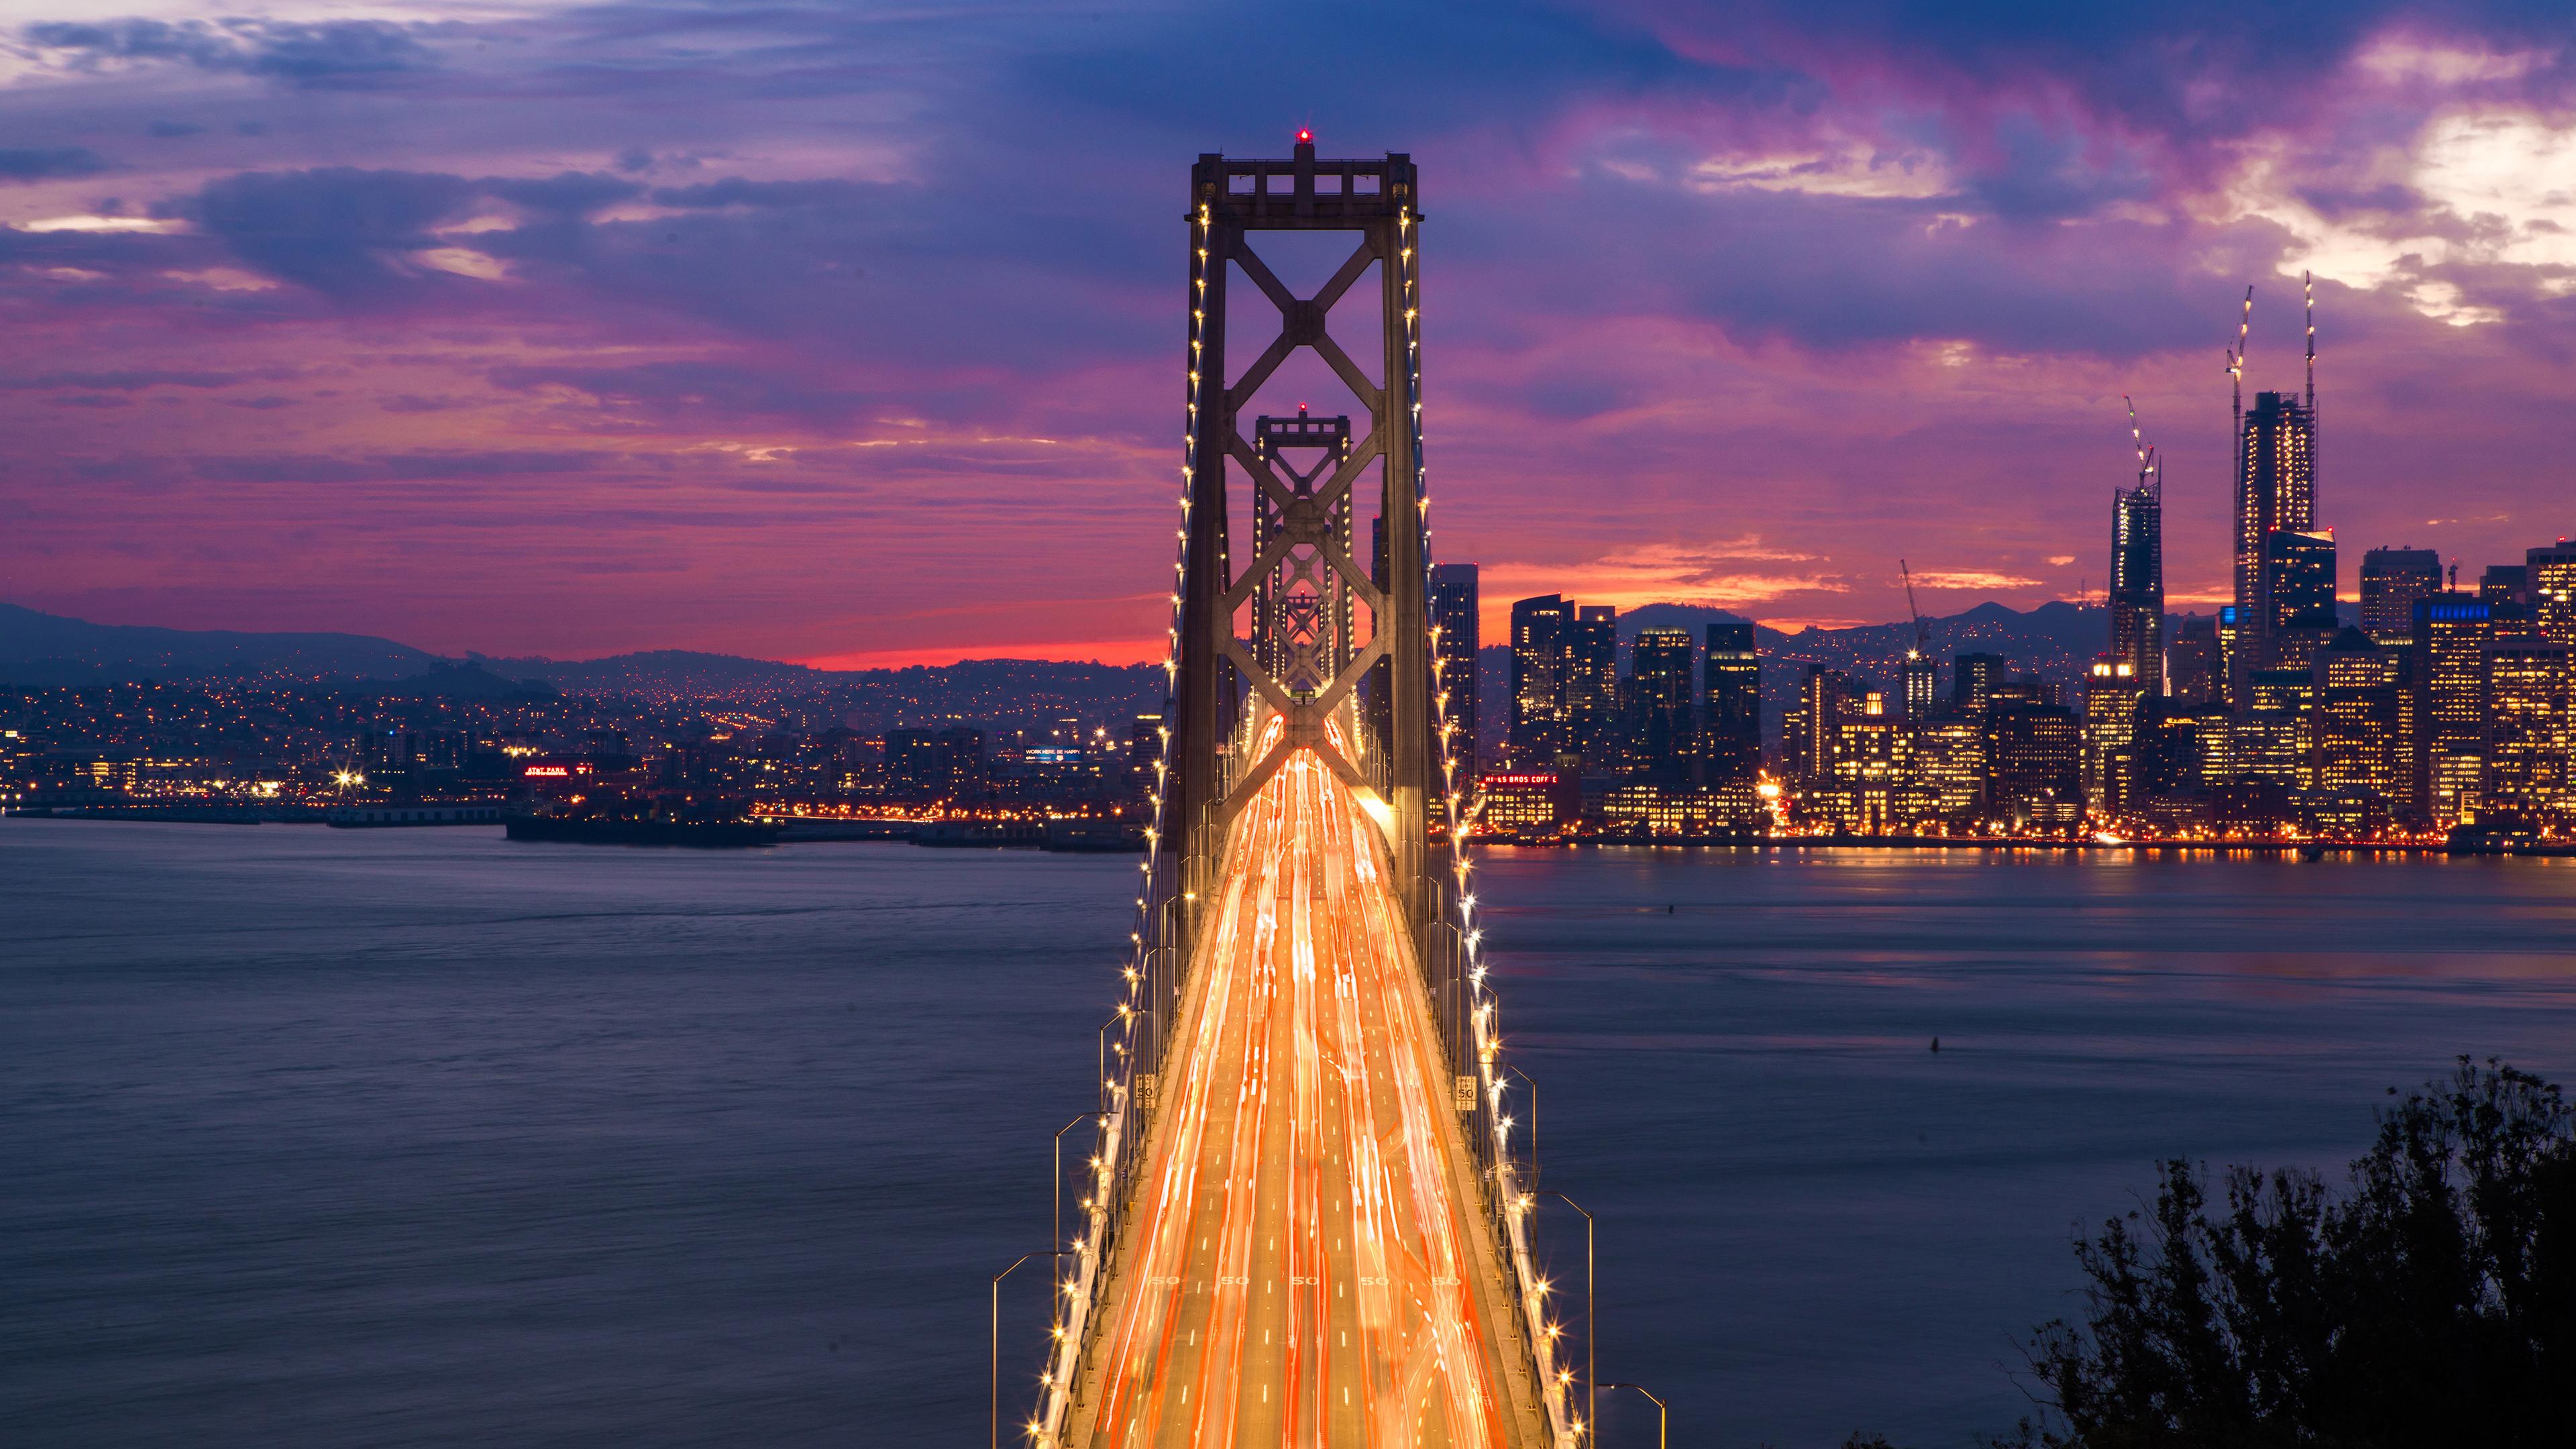 Bridge Time Lapse Night Clouds Cityscape 4k, HD ...